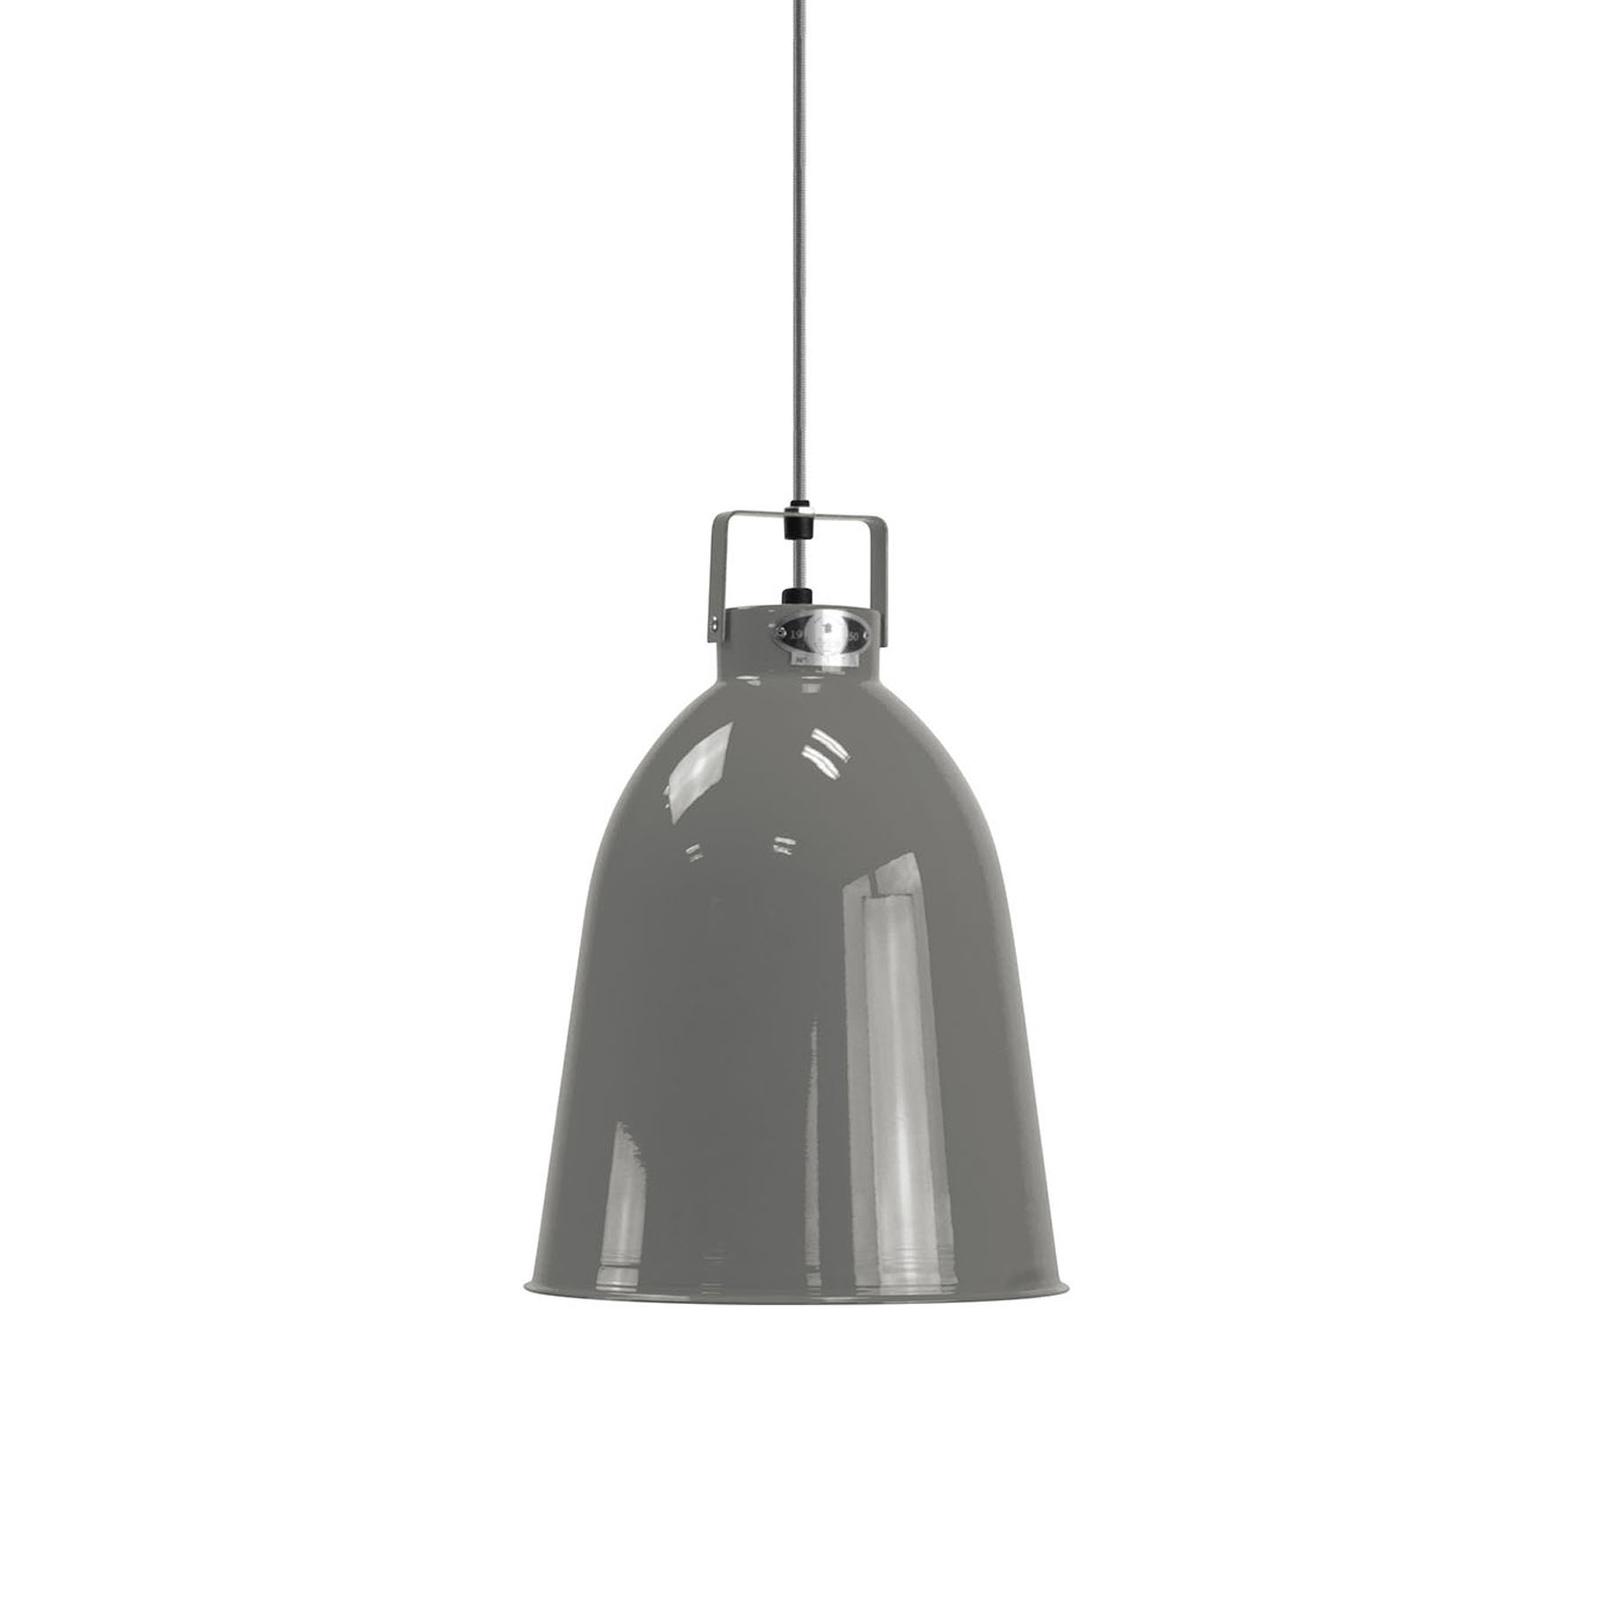 Jieldé C240 hængelampe, blank grå Ø24 cm